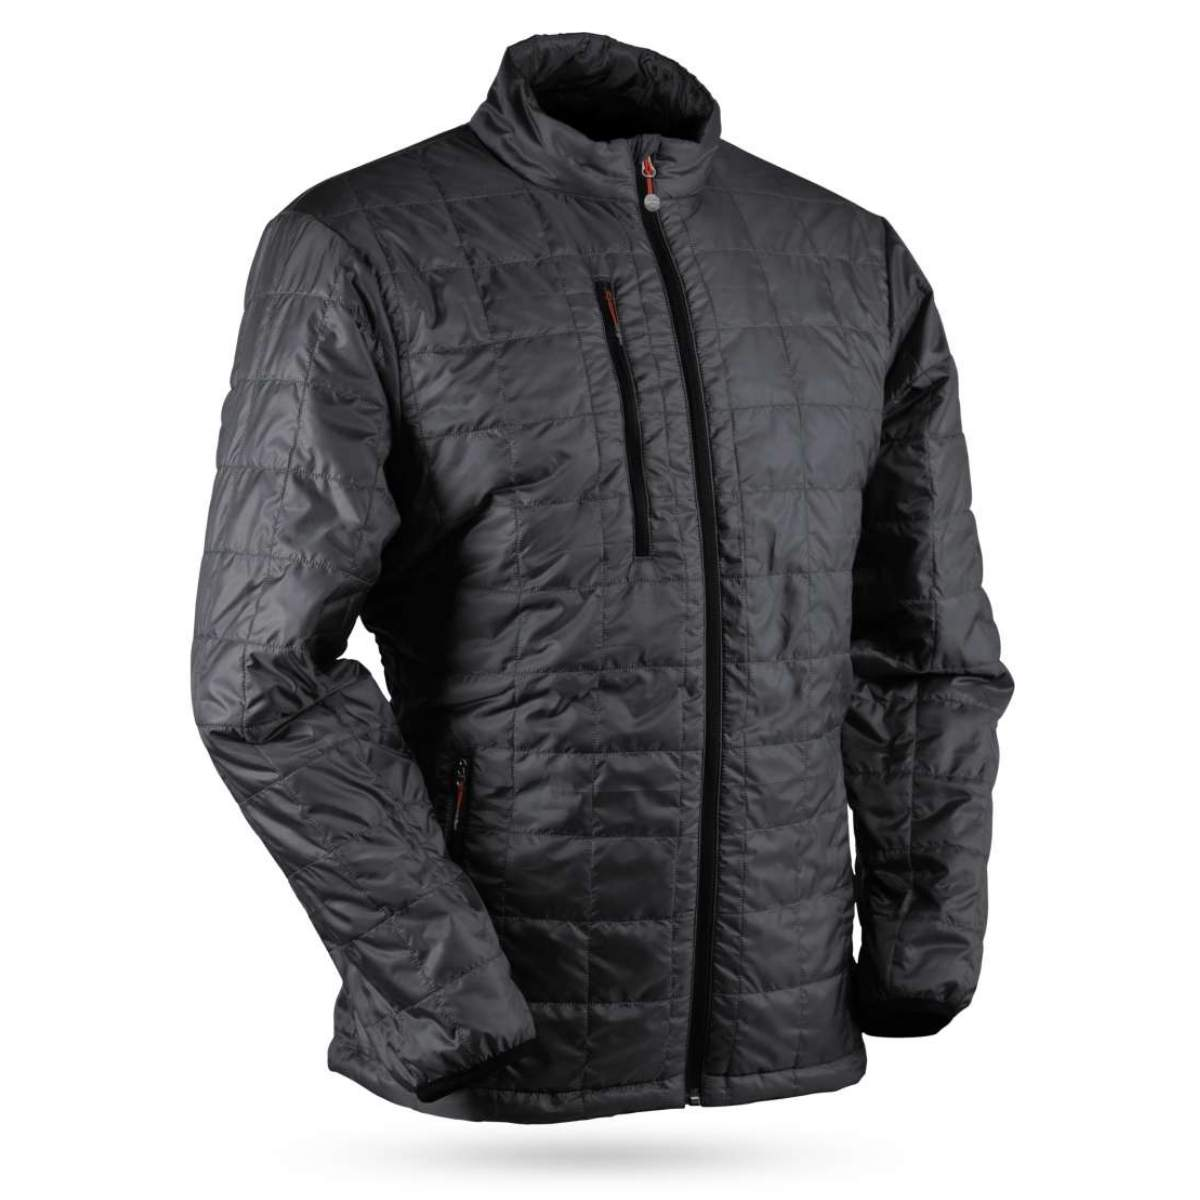 Sun Mountain 2021 Men's Granite Jacket